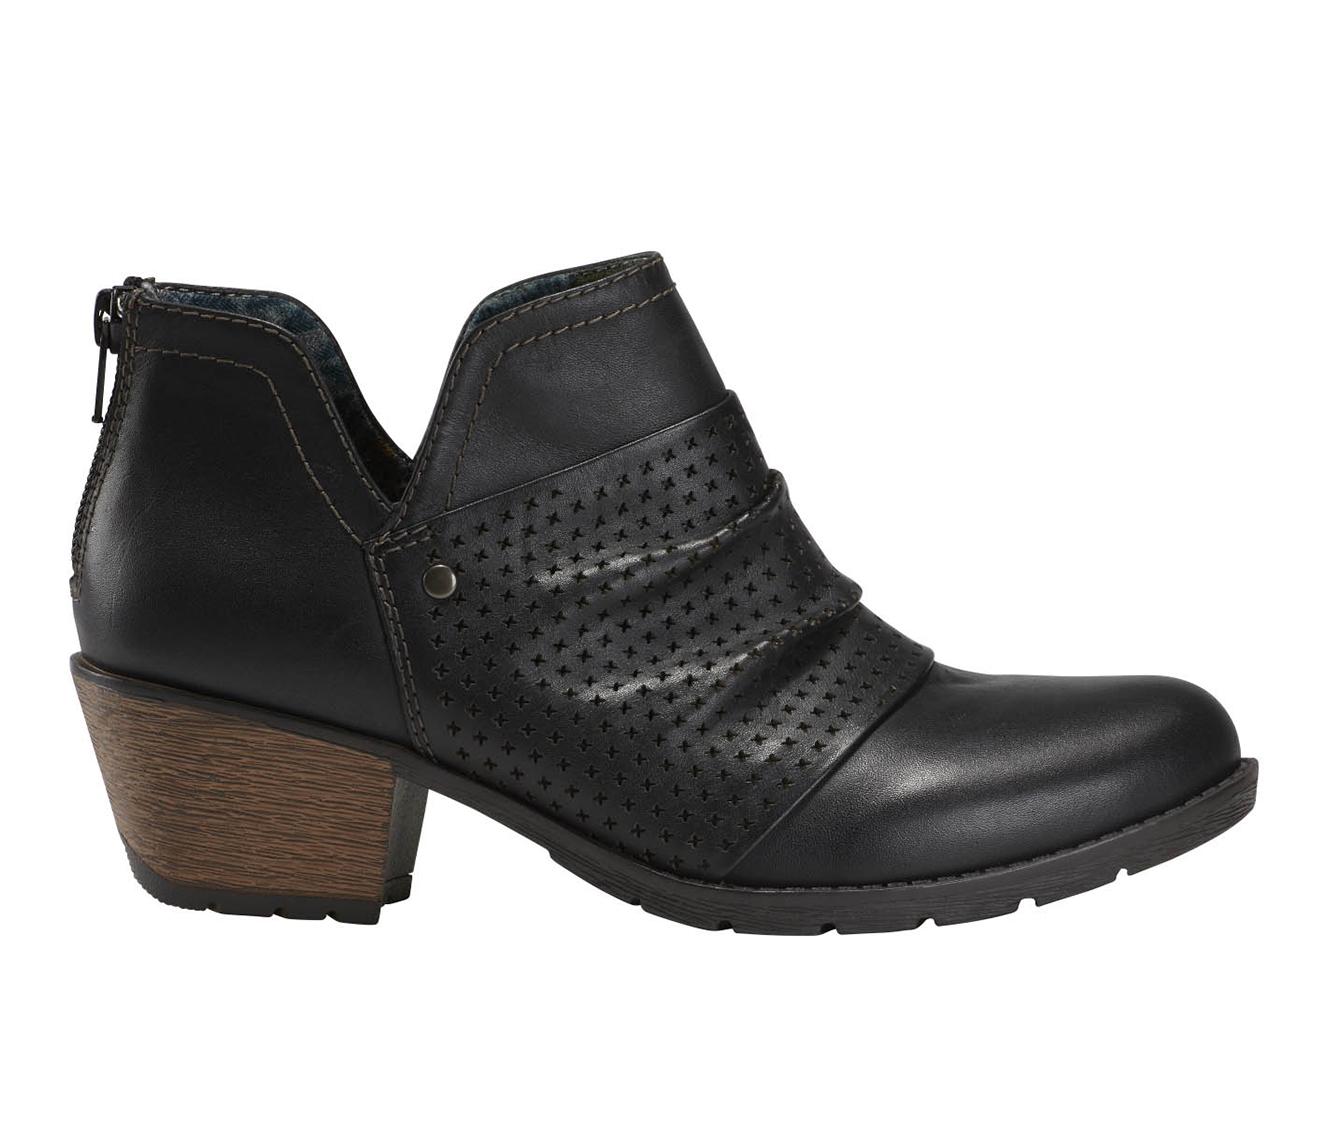 Earth Origins Oakland Amanda Women's Boots (Black - Leather)